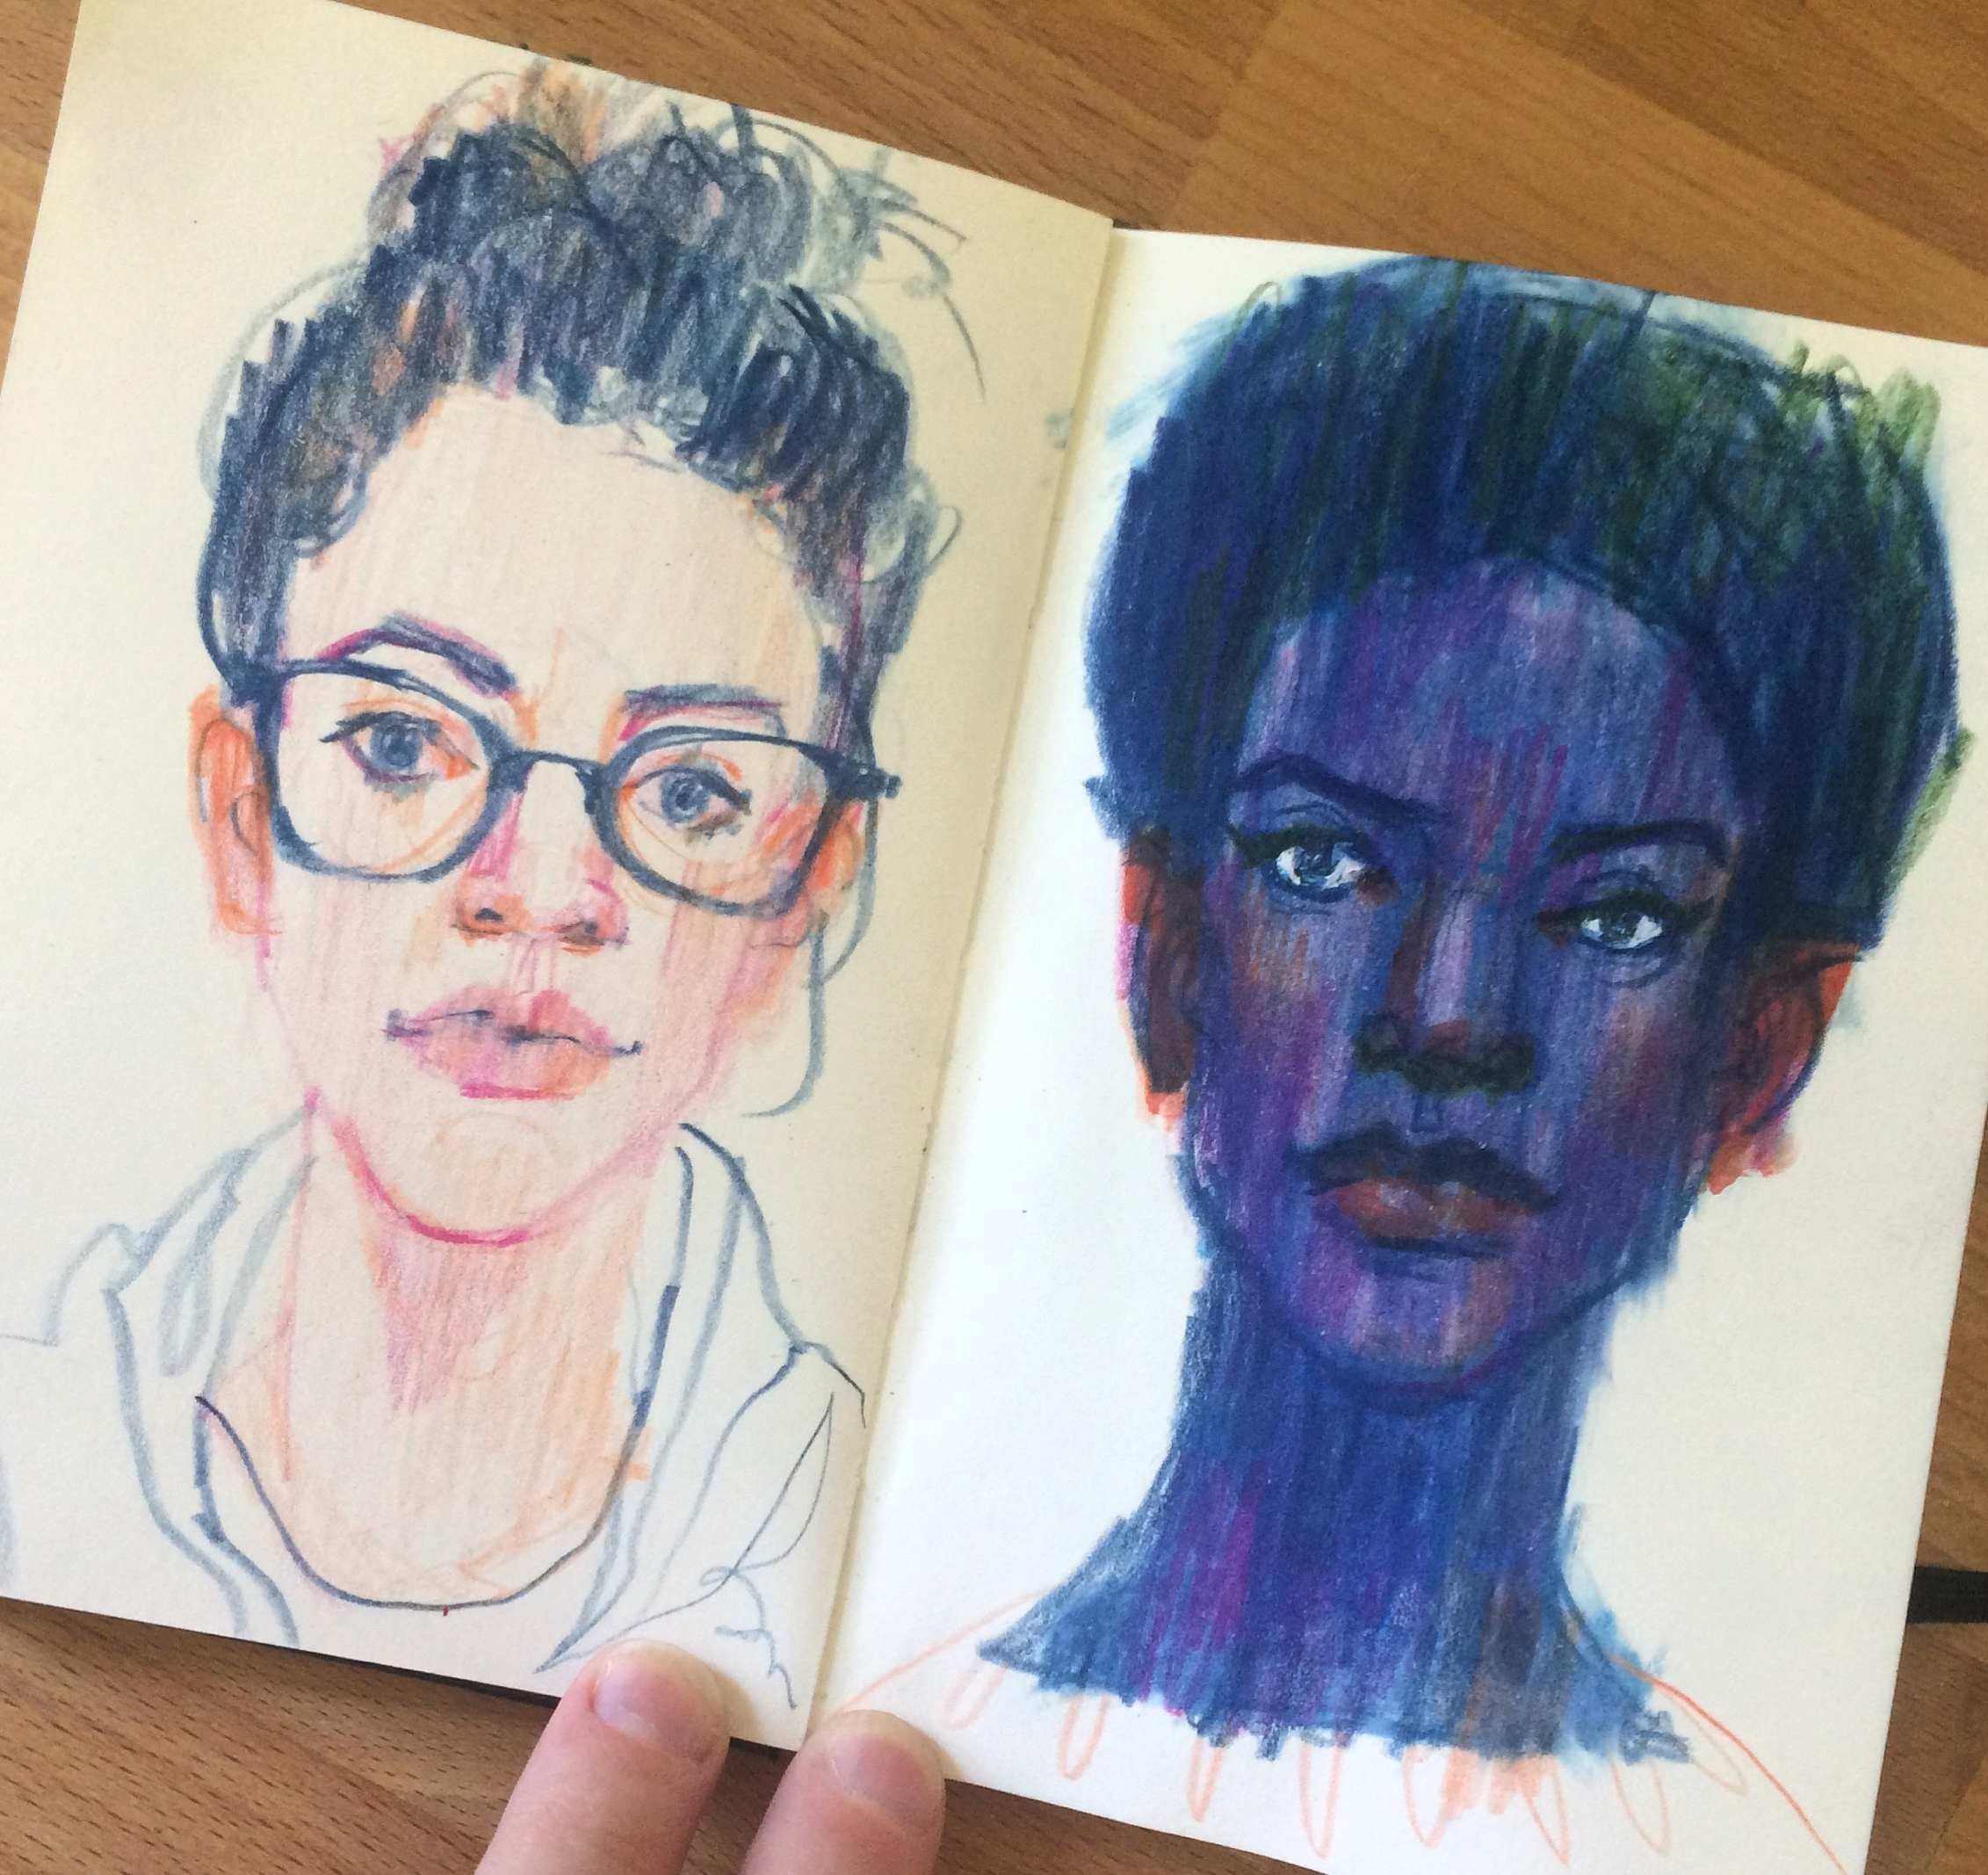 10 minute portrait warm-ups